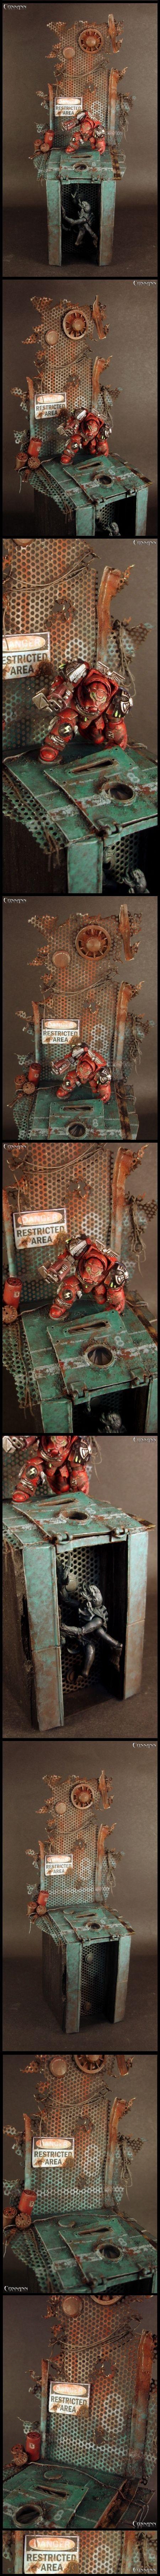 Blood Angels, Genestealer, Space Hulk, Space Marines, Terminator Armor, Tyranids, W40k, Warhammer 40,000